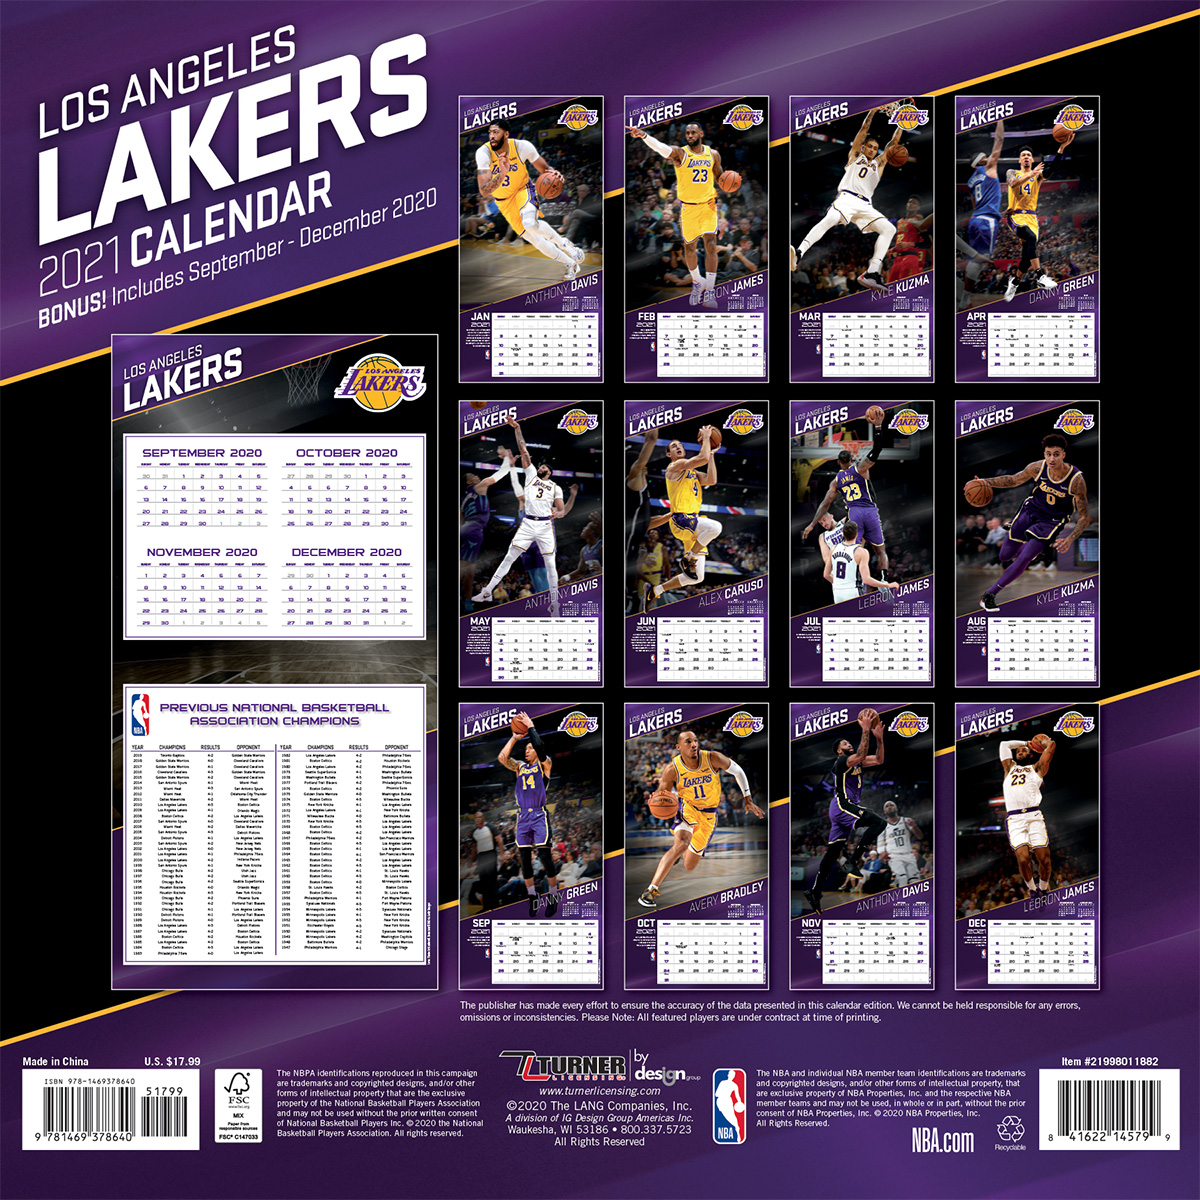 Los Angeles Lakers 2018 Wall Calendar Buy At Khc Sports